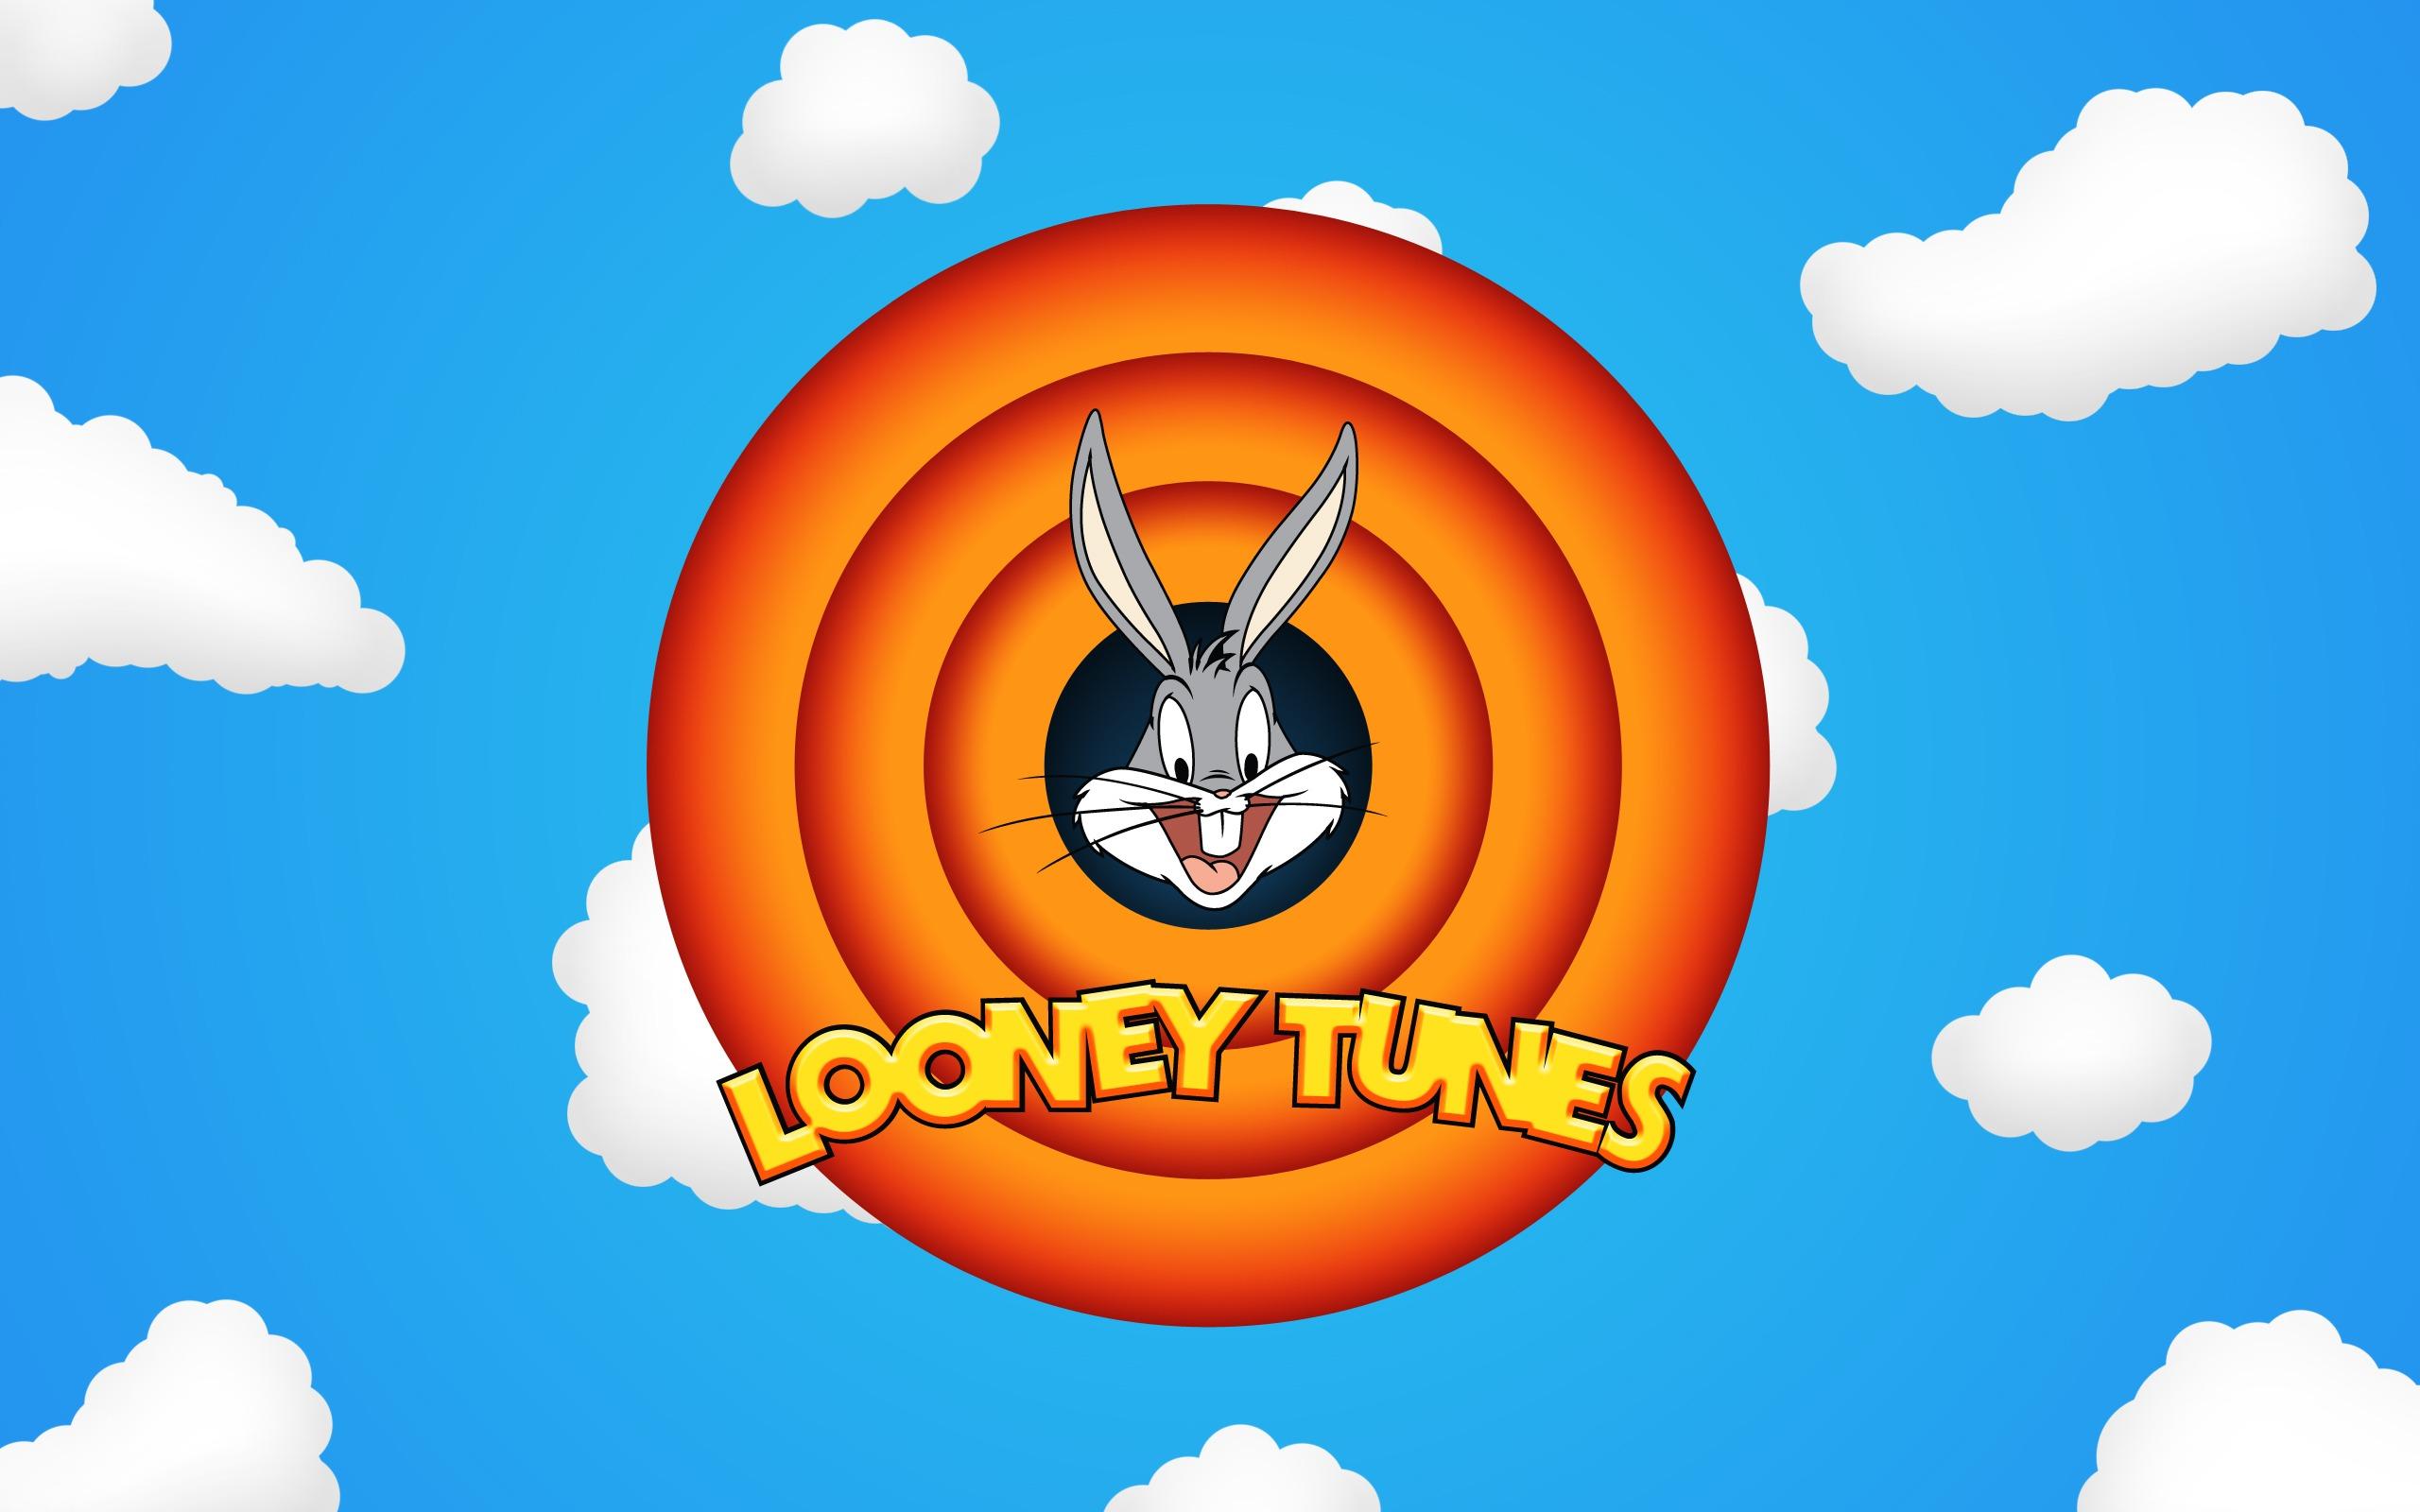 fantastic looney tunes wallpaper 45561